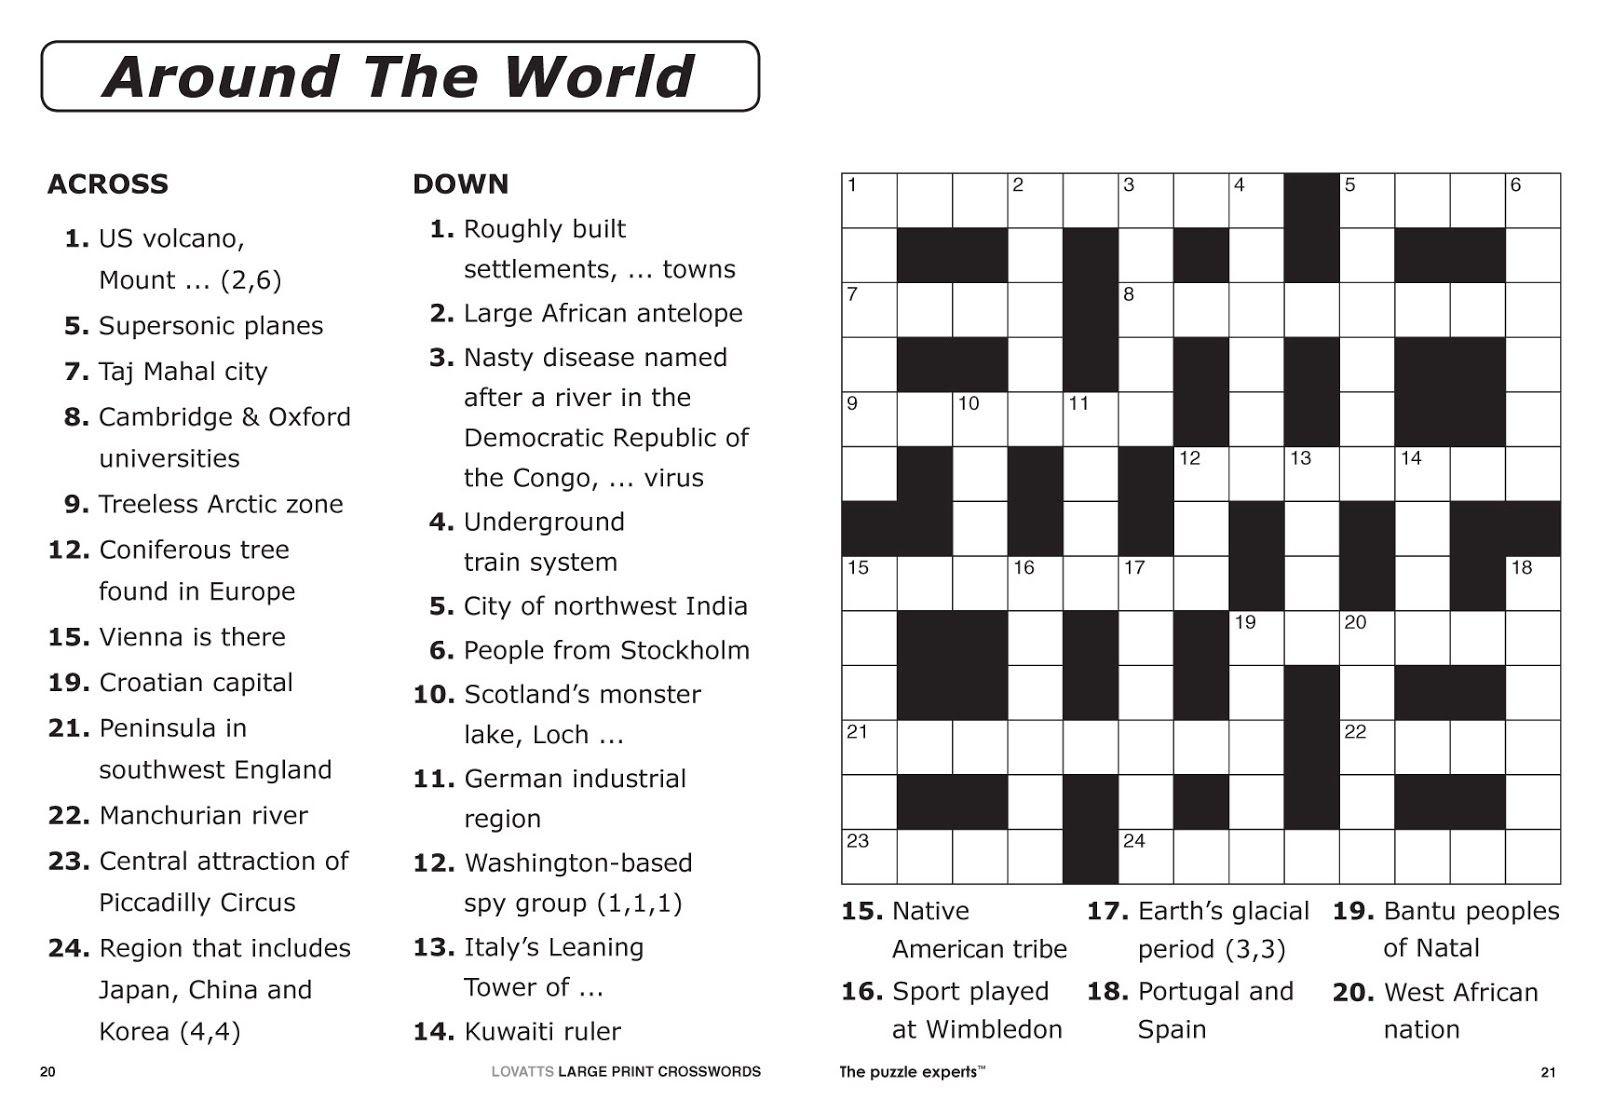 Free Printable Large Print Crossword Puzzles | M3U8 - Printable Crossword Puzzles For Senior Citizens